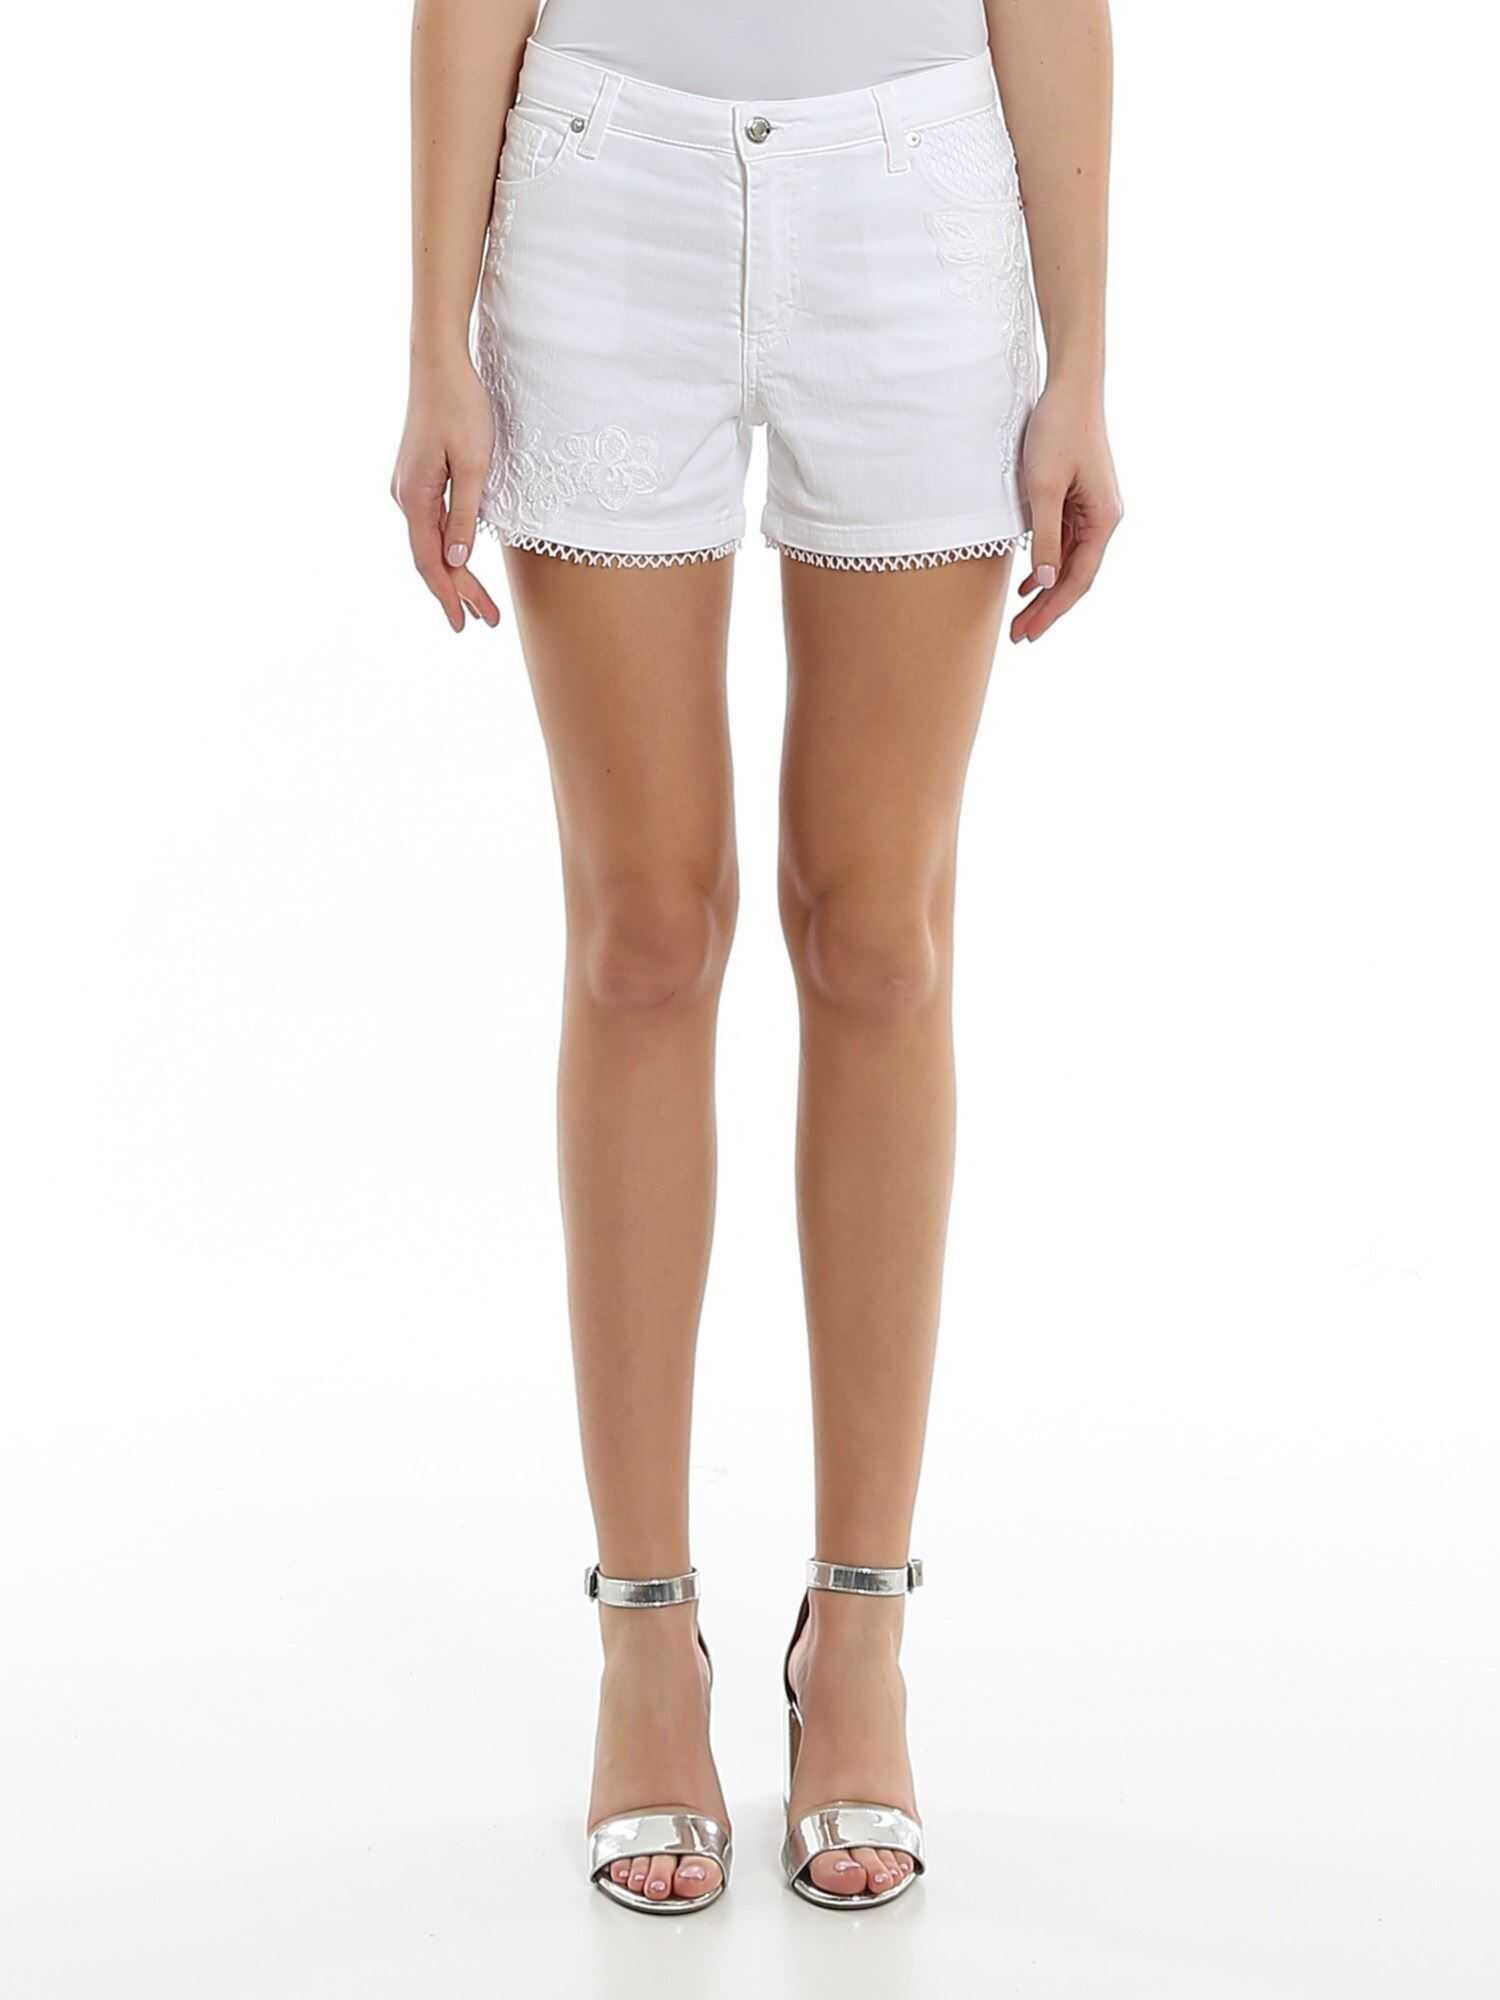 Ermanno Scervino Floral Embroidery Denim Shorts White